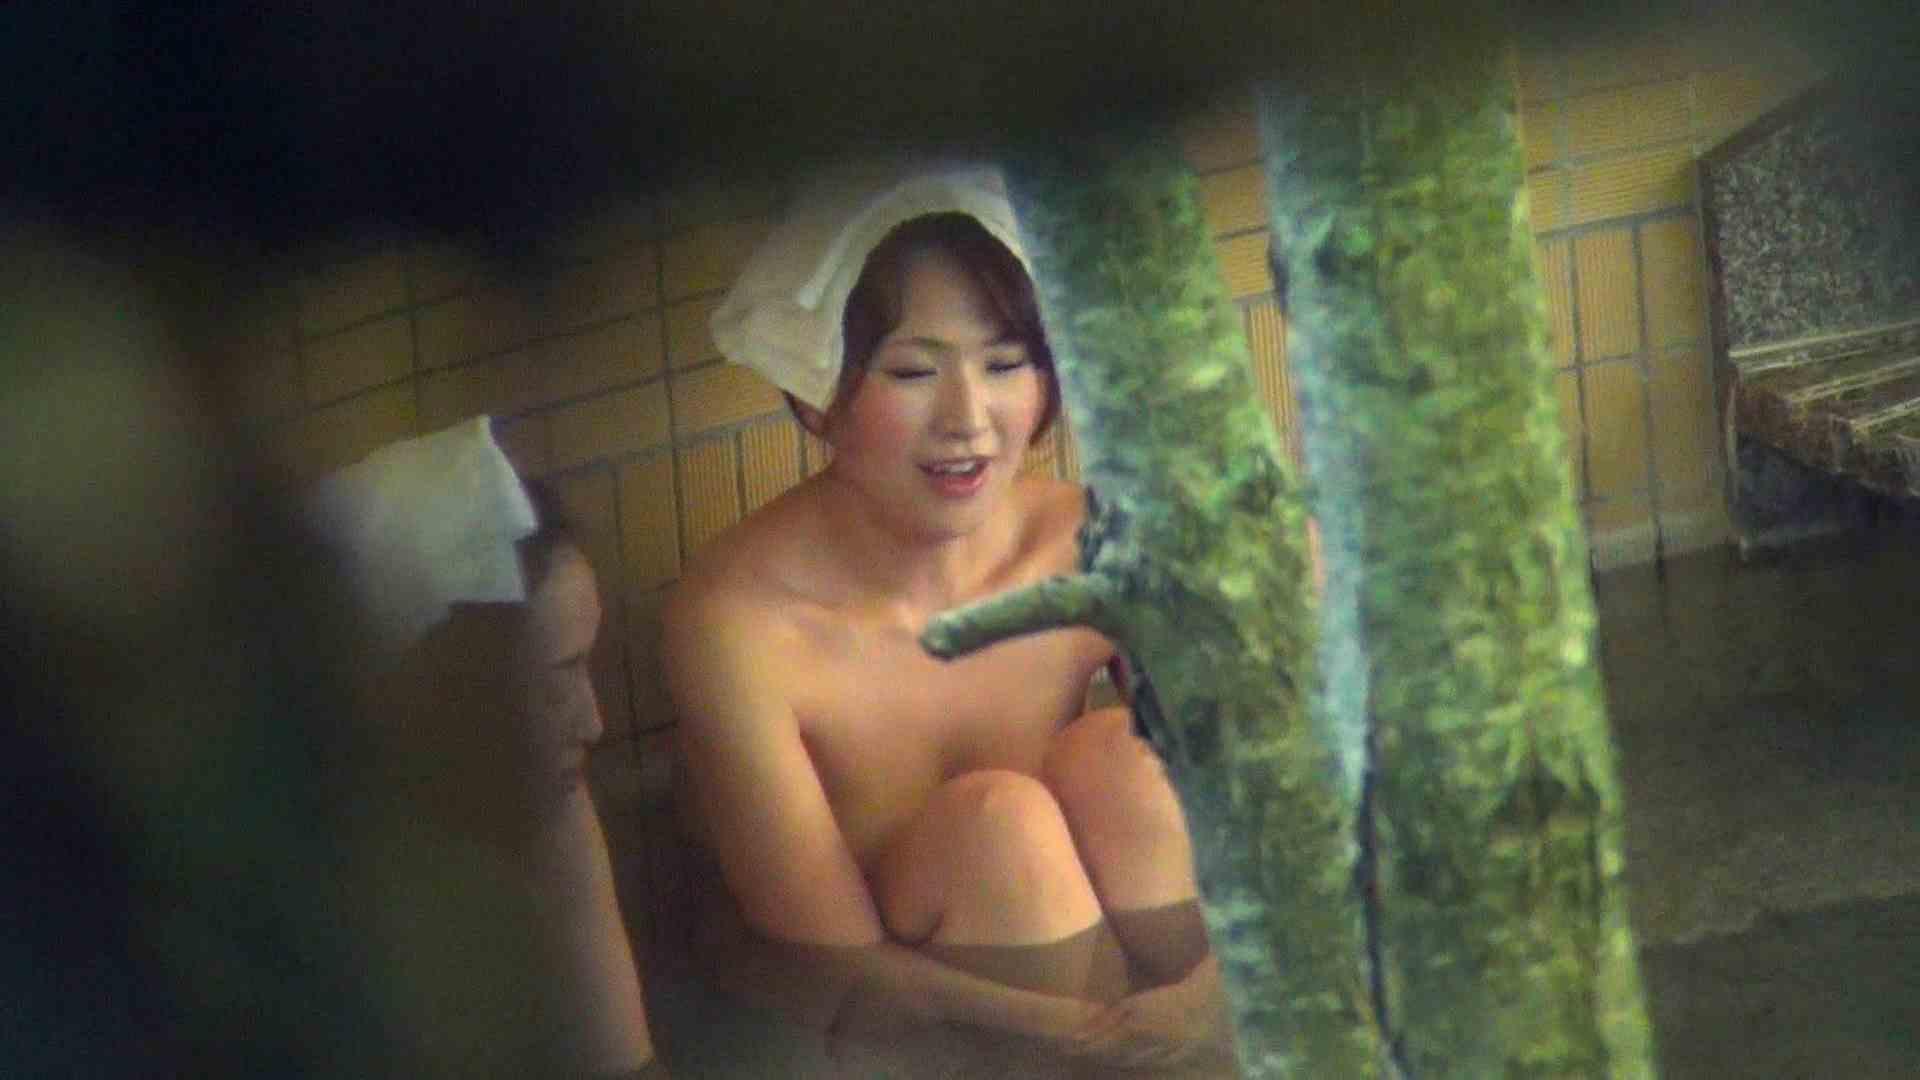 Aquaな露天風呂Vol.272 盗撮 われめAV動画紹介 99PICs 14